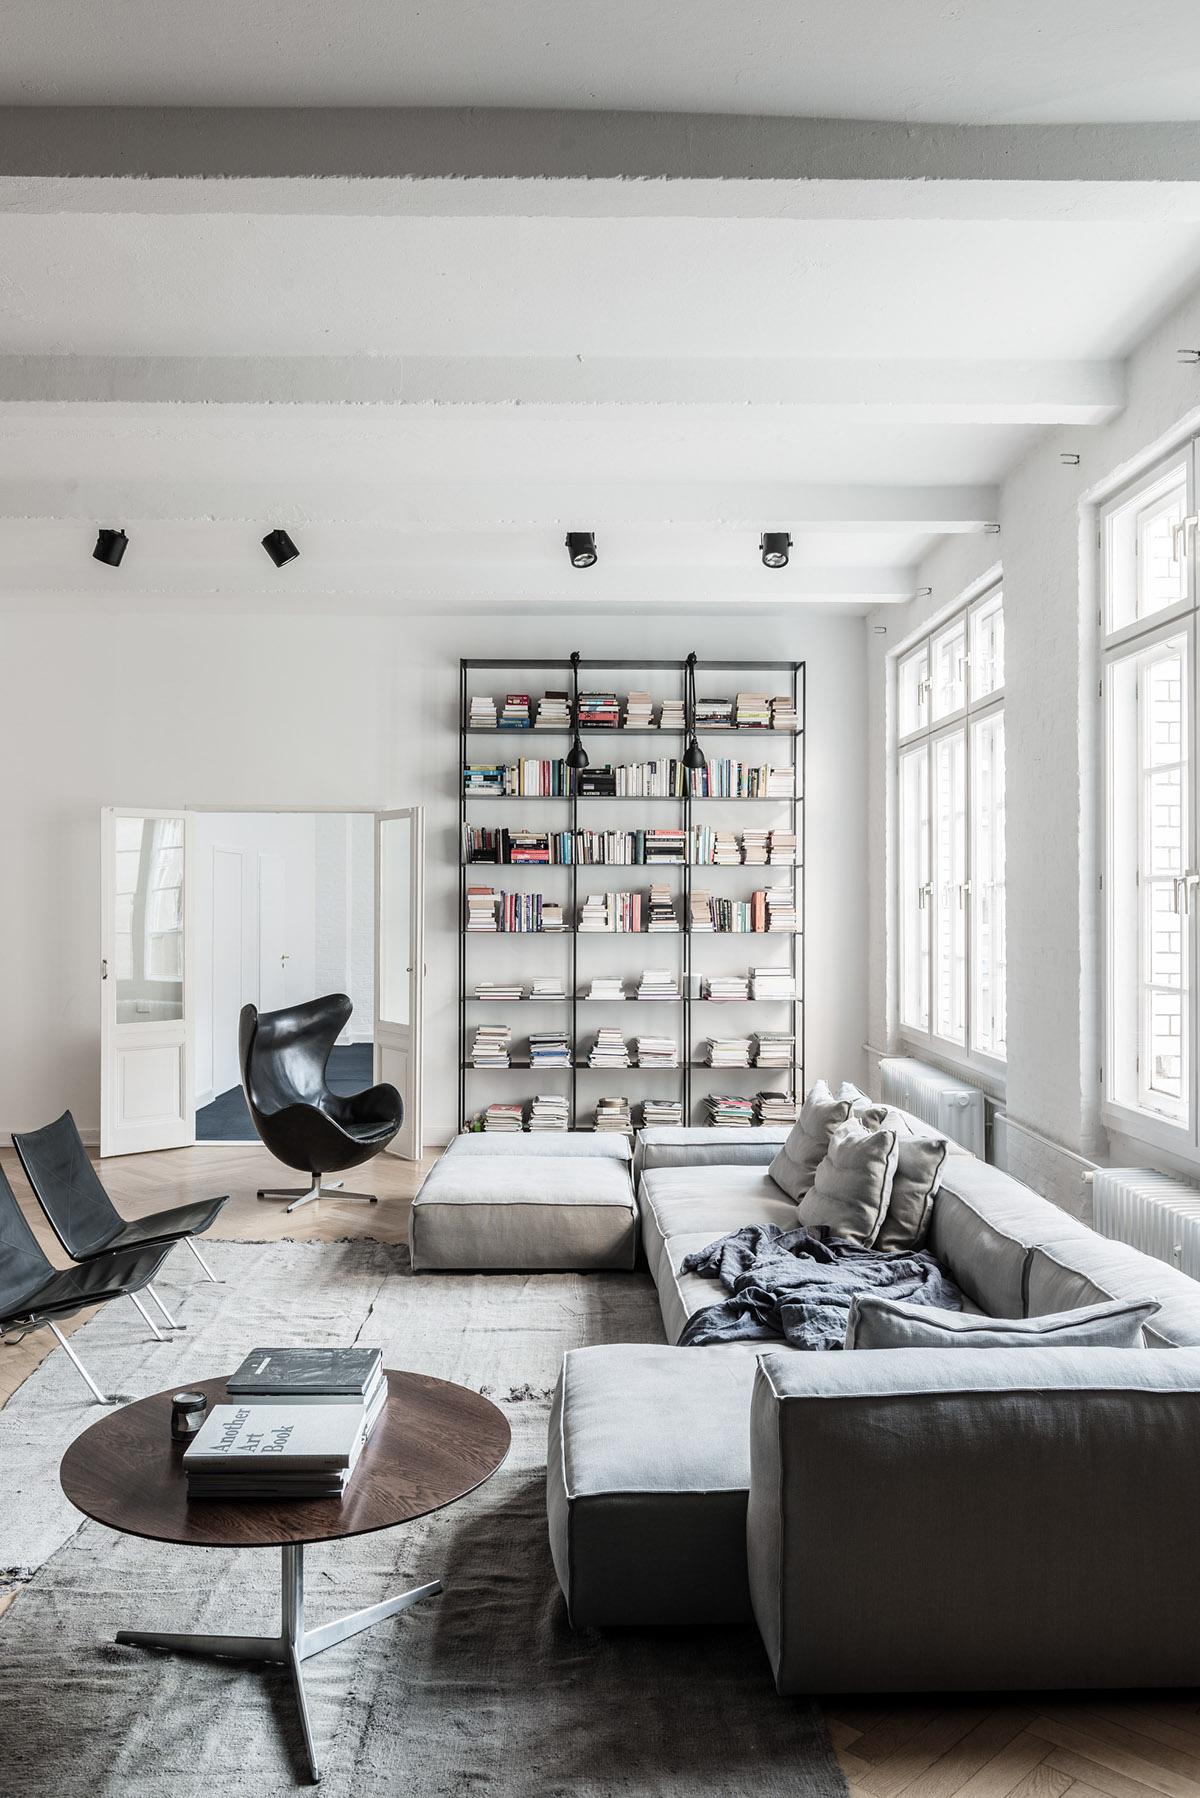 Loft Apartment & Studio in Berlin by Annabell Kutucu | Yellowtrace